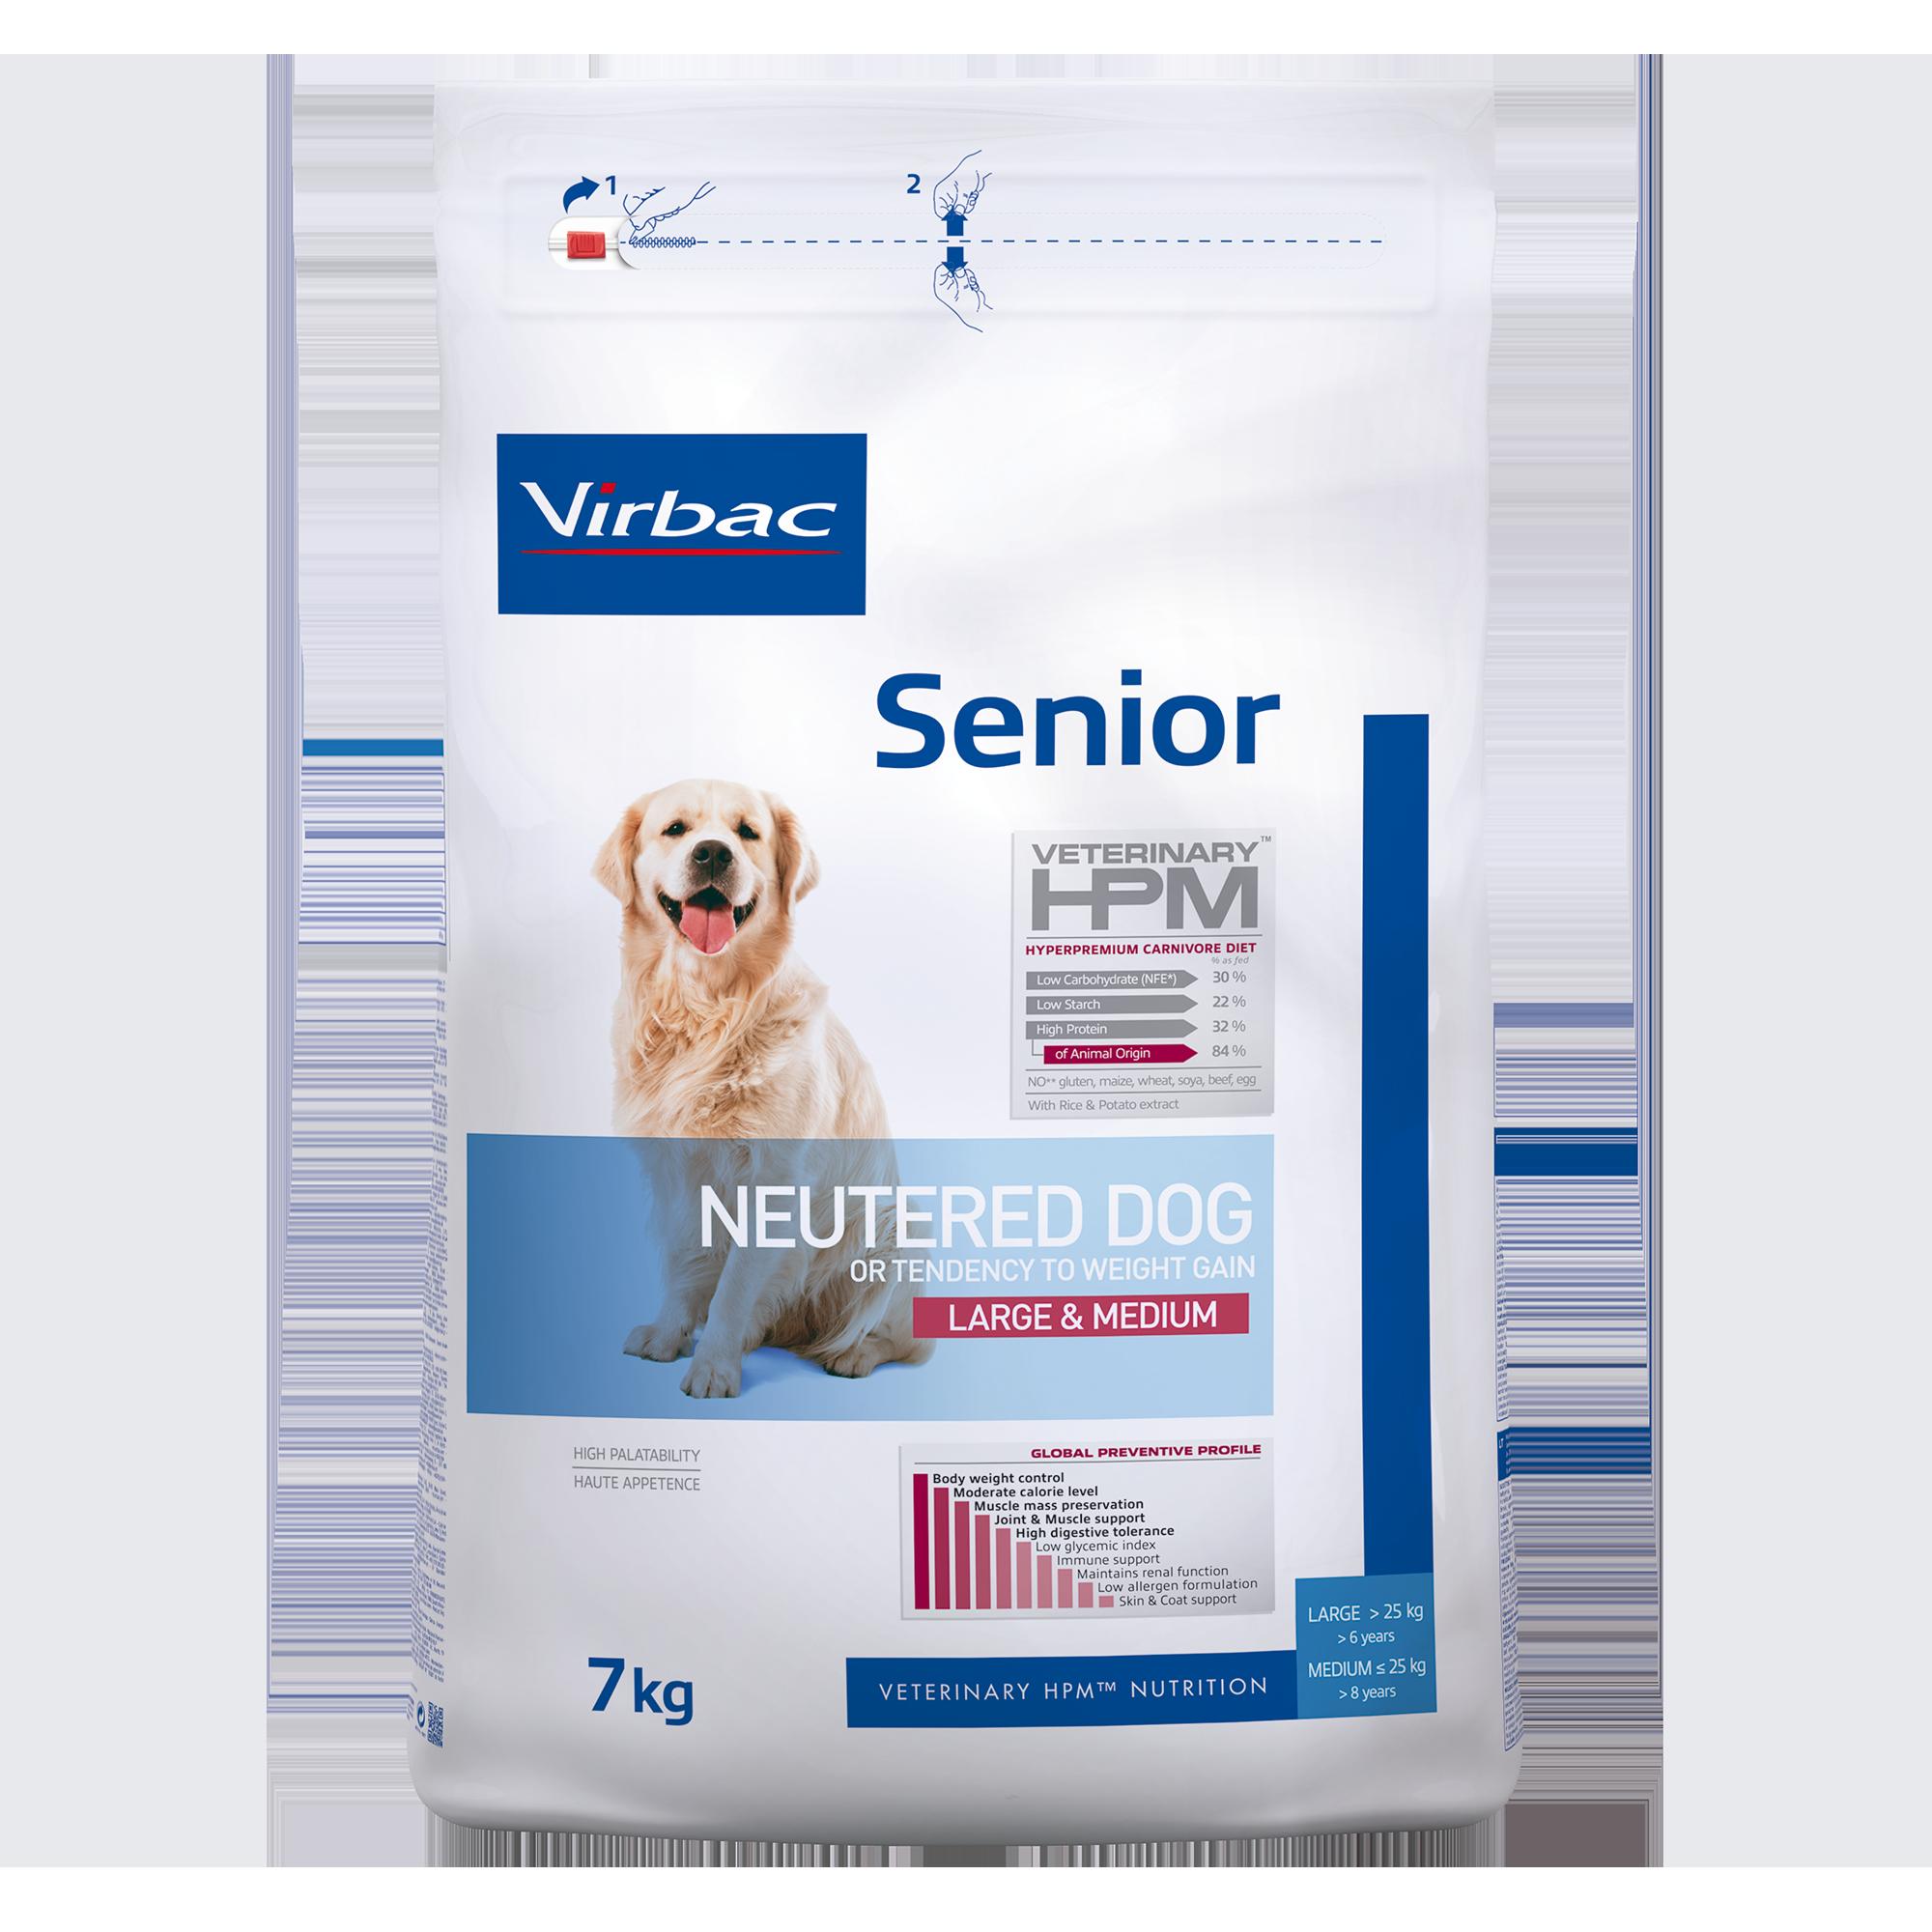 Senior Neutered Dog Large & Medium - 7 kg